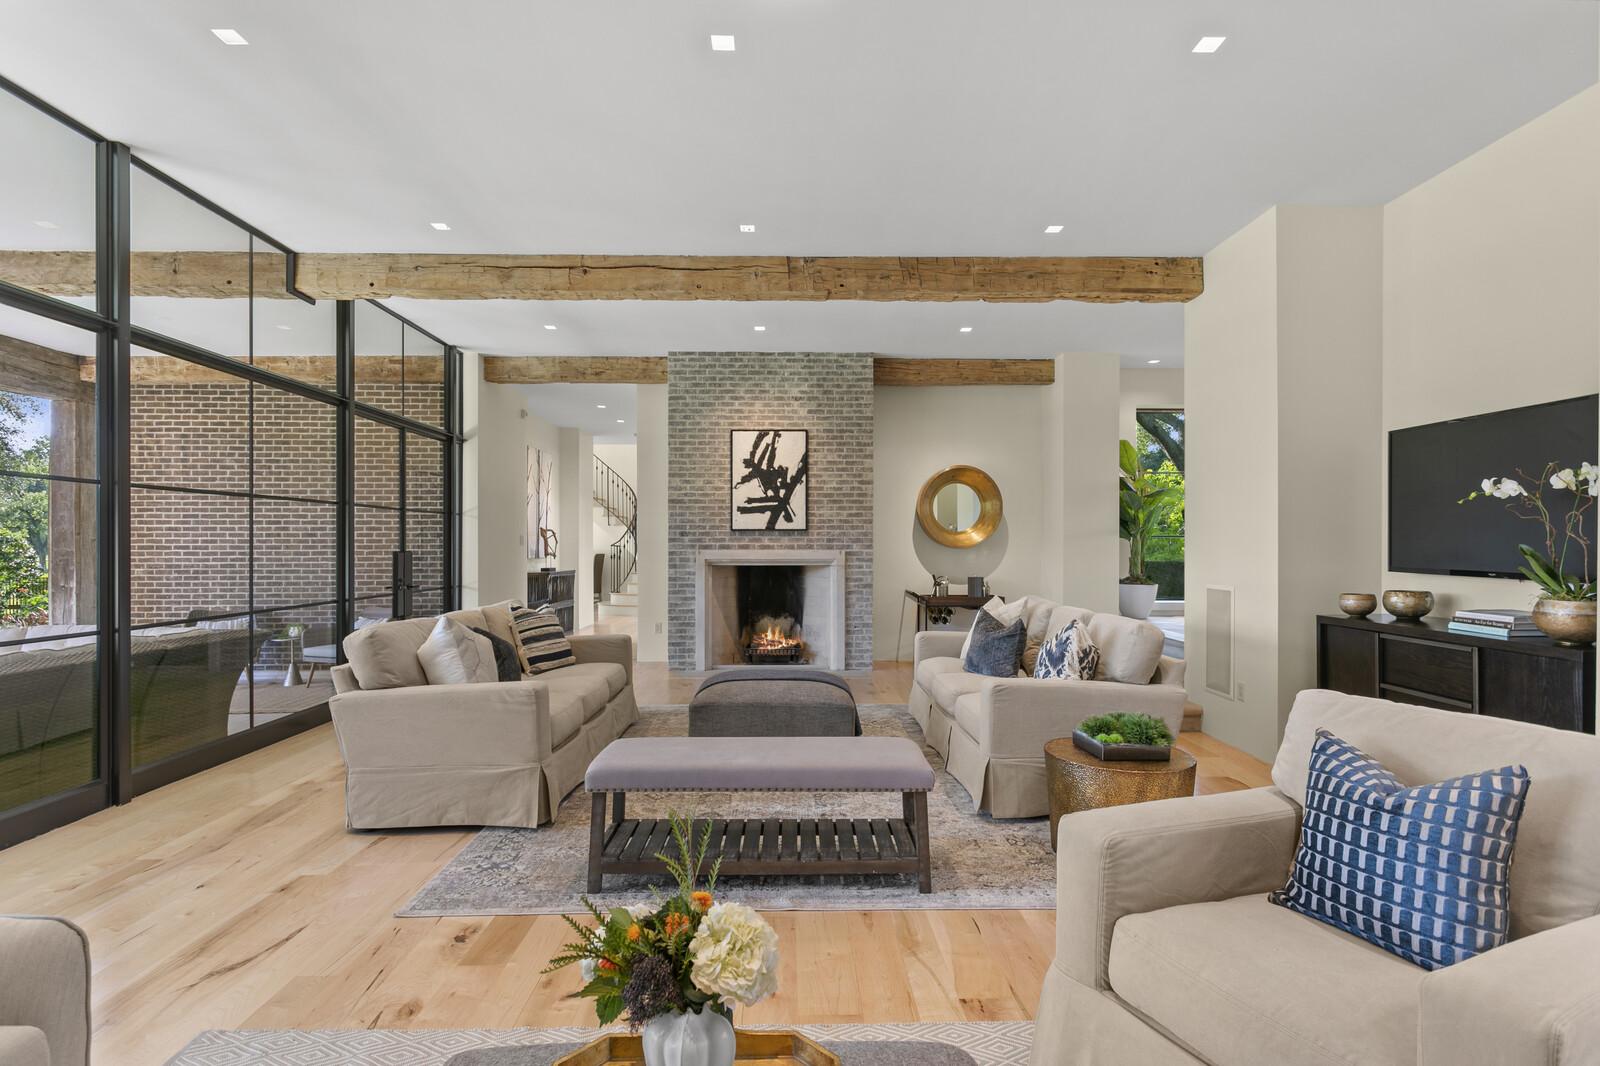 Rustic, organic home ideas